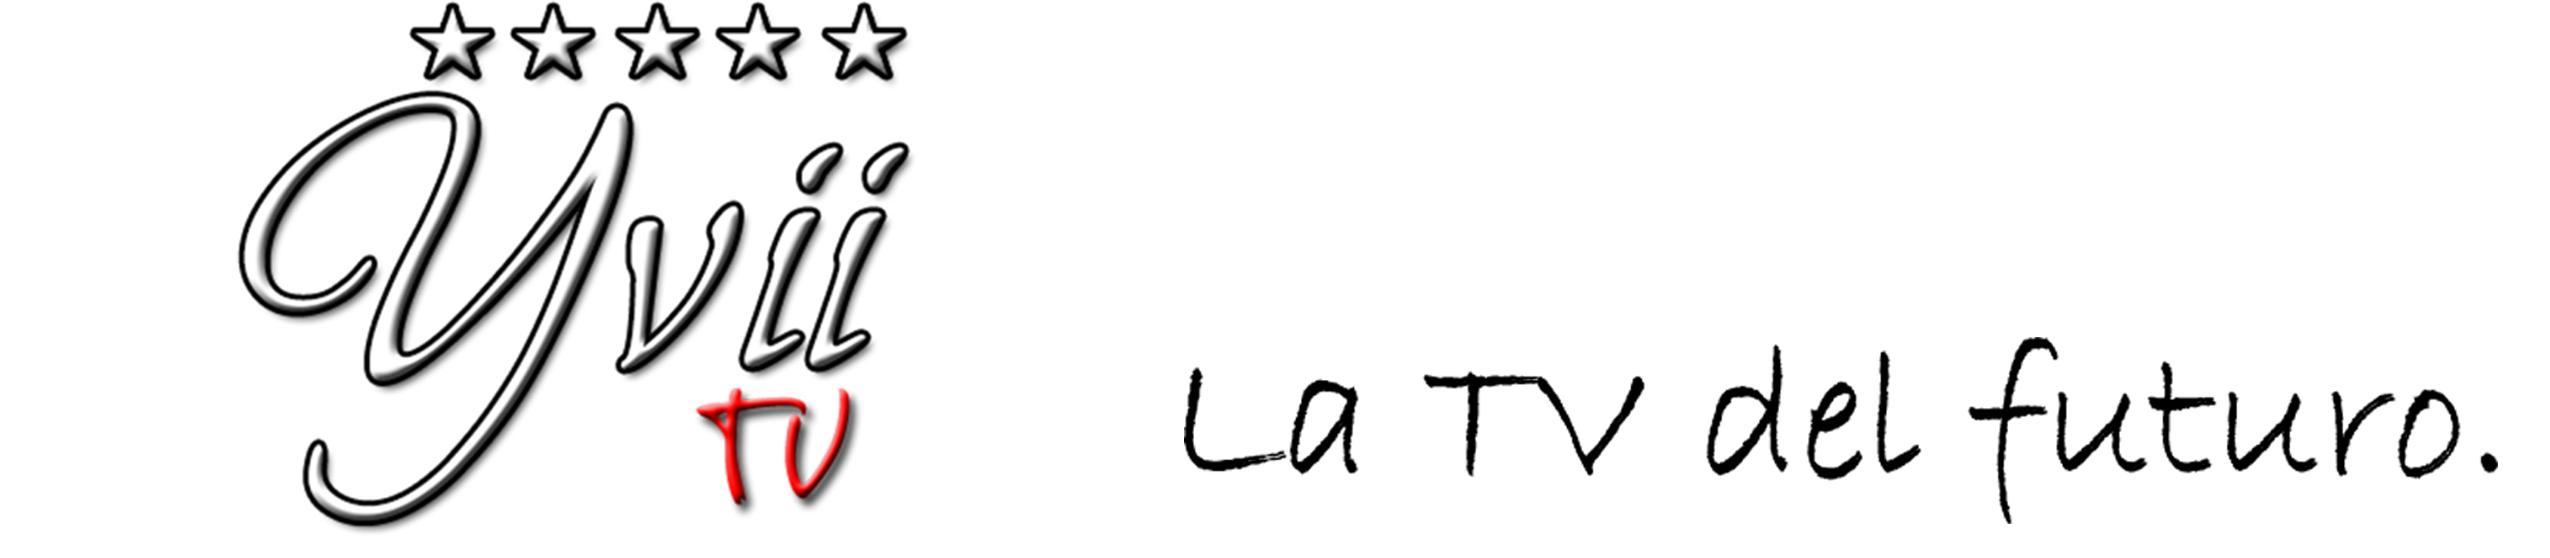 Yvii TV.com